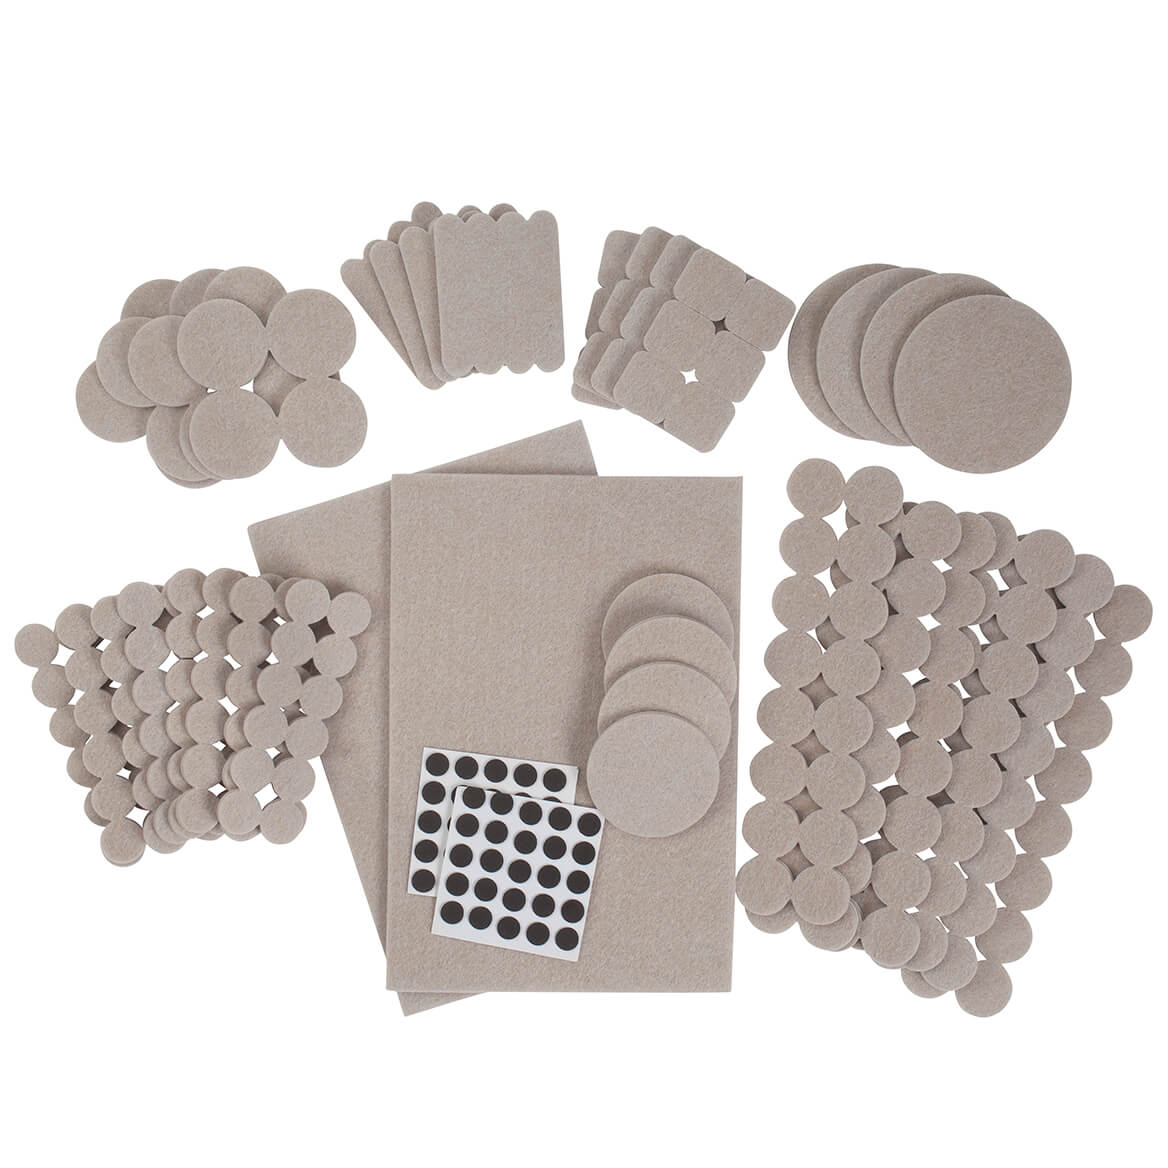 308-Piece Furniture Pad Variety Pack by LivingSURE™-366048